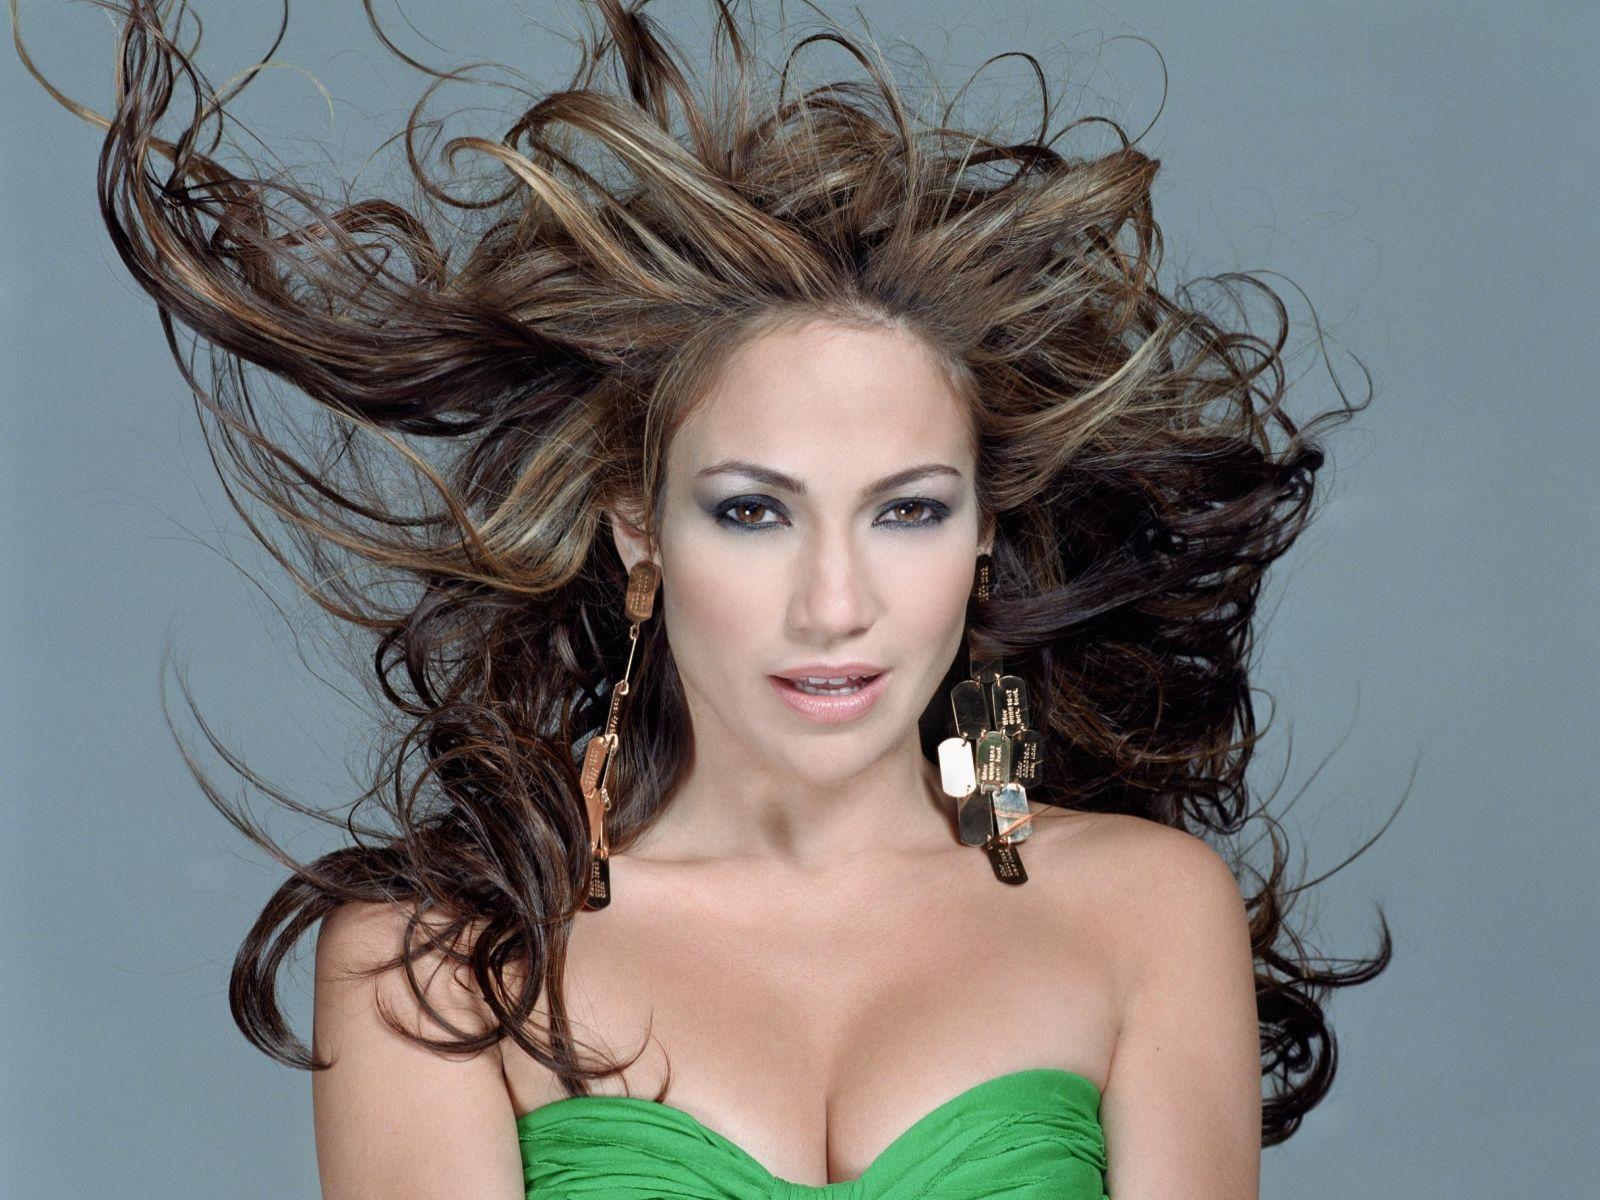 http://4.bp.blogspot.com/-vTfhpxesOI0/T9fiL90RbII/AAAAAAAAD08/uOpSc9_5jEY/s1600/Jennifer_Lopez_hot_sexy_wallpaper_latest+(5).jpg